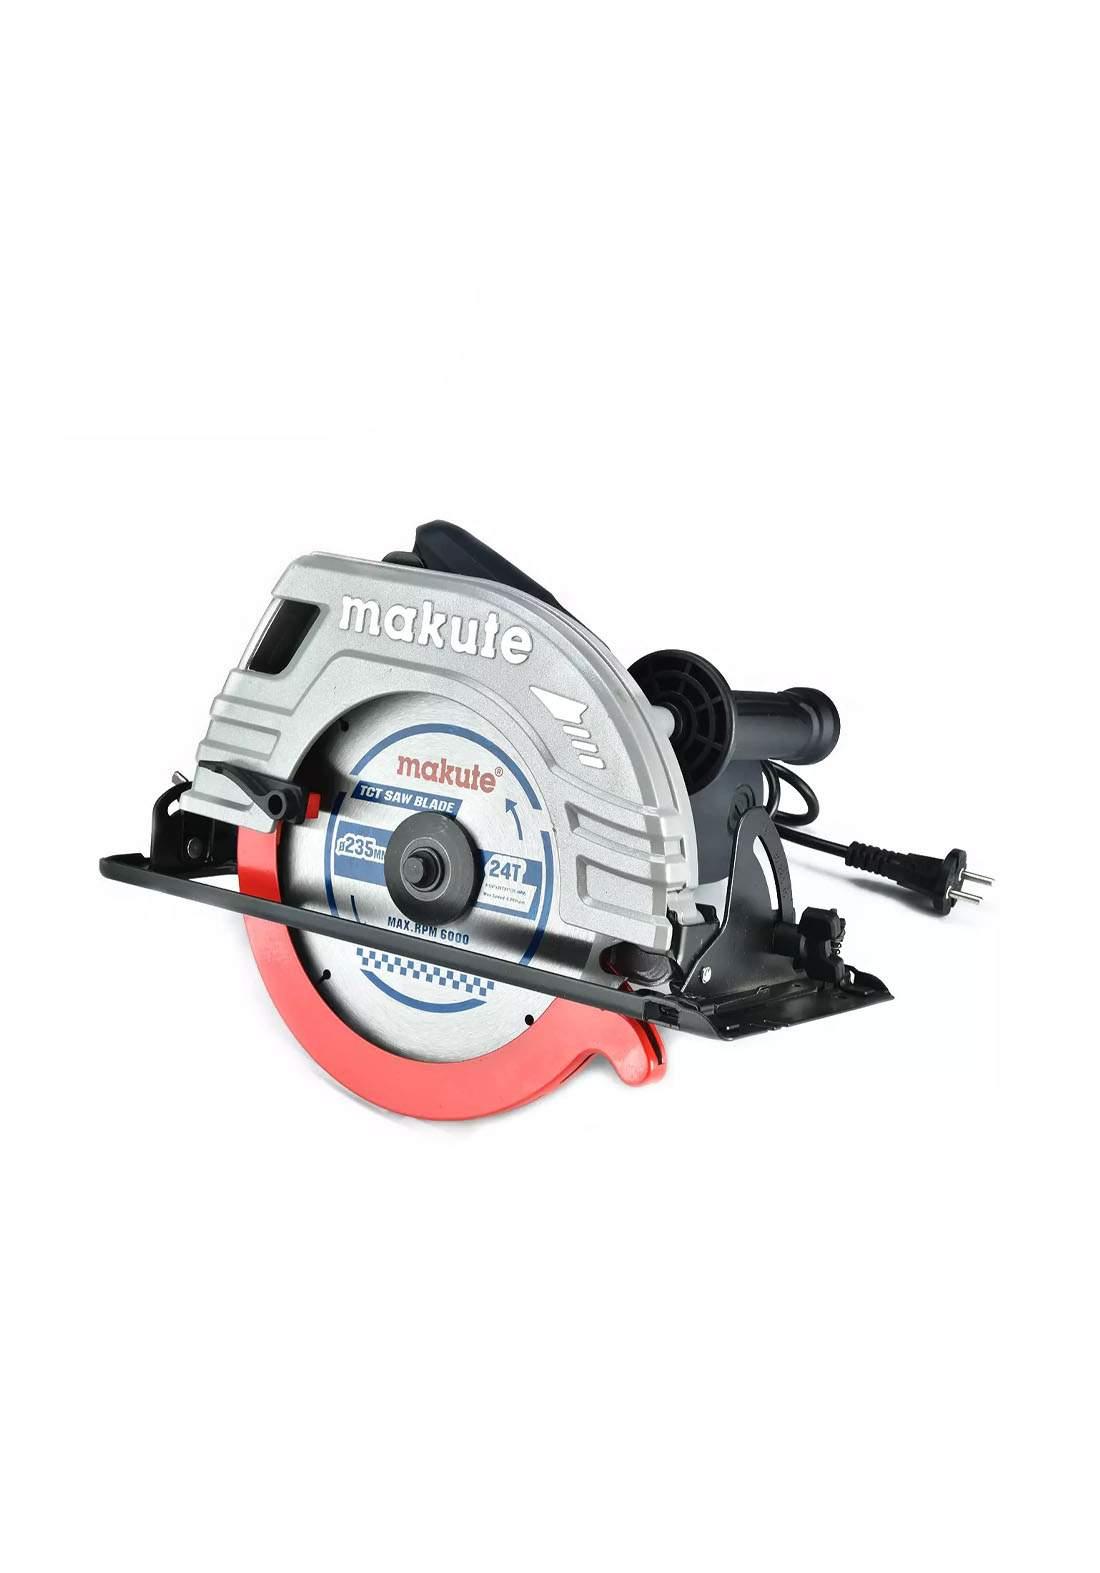 Makute CS004 Circular Saw 235 mm 2200 W 4100 Rpm منشار كهربائي قرصي